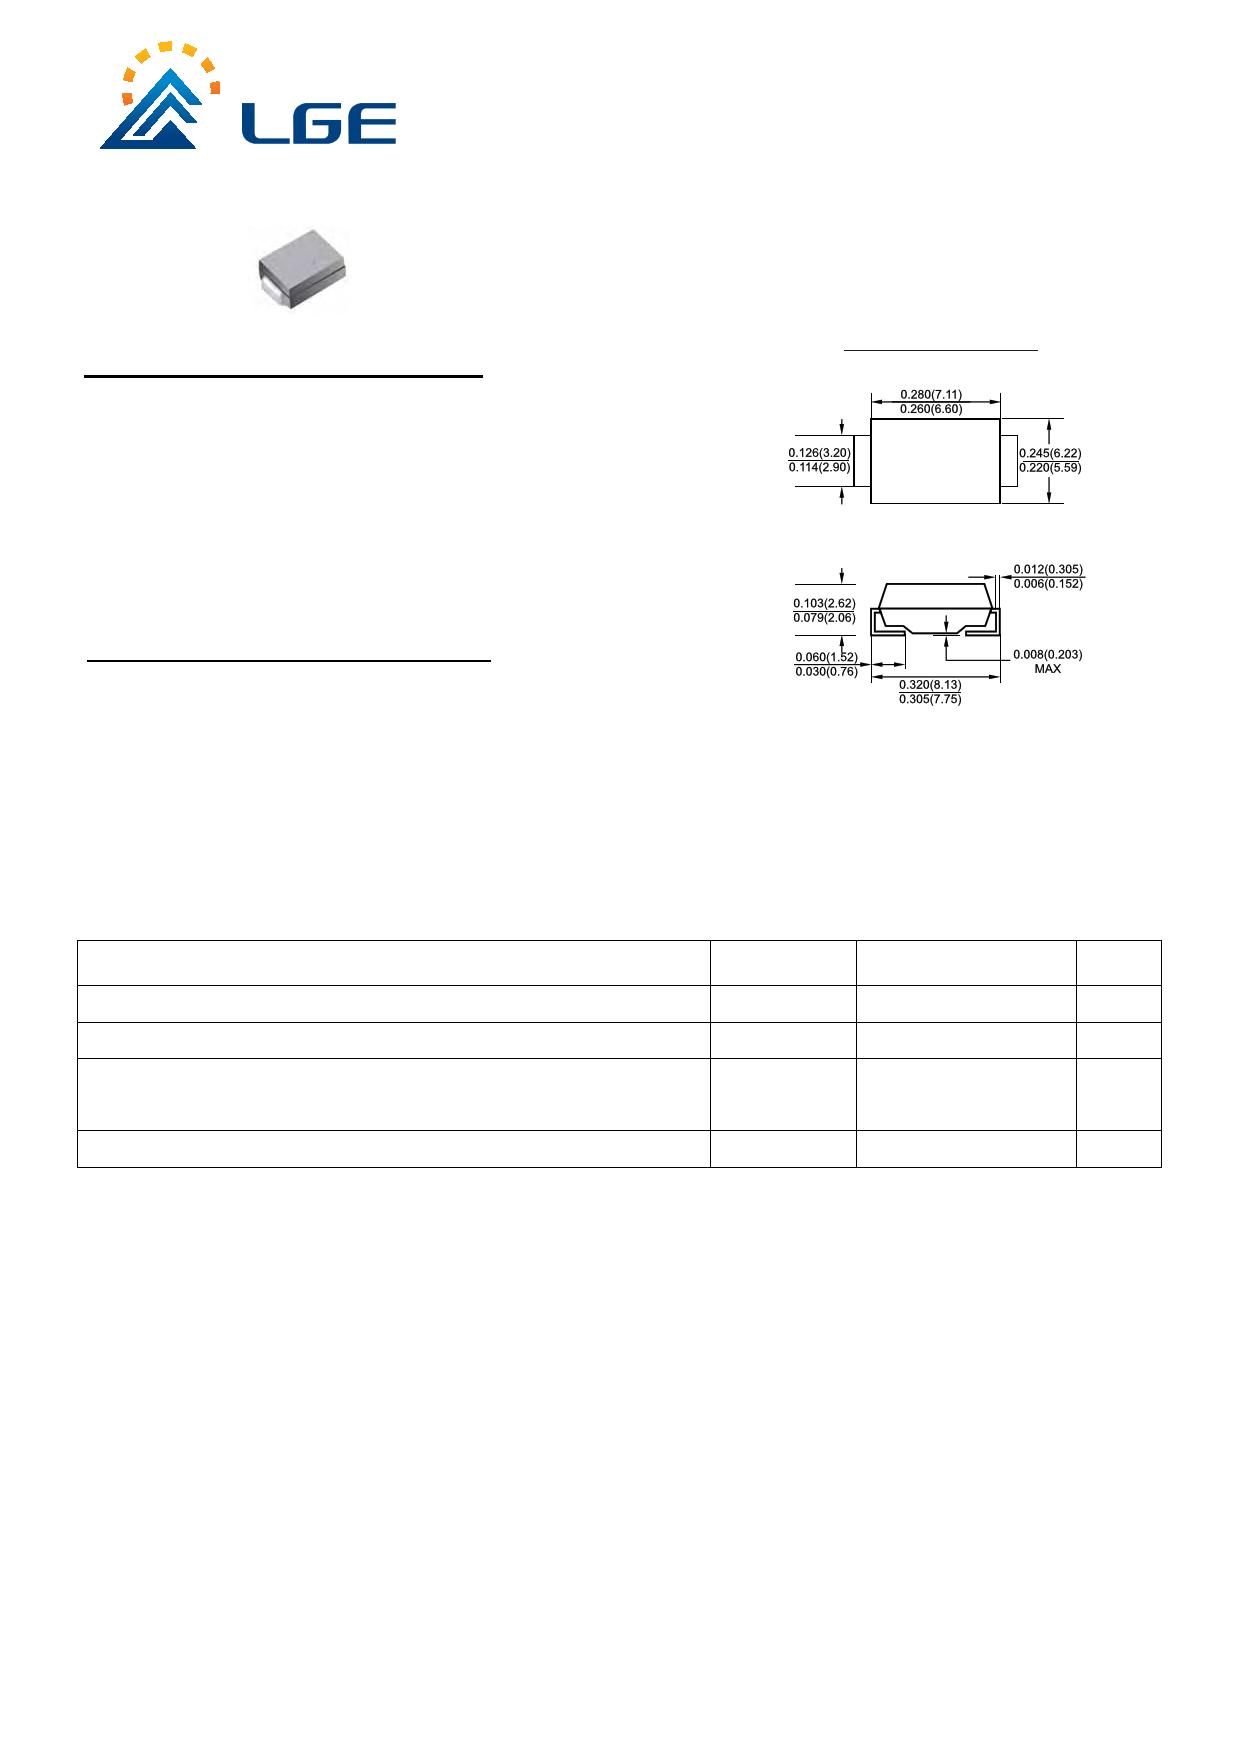 3.0SMCJ220CA Datasheet, 3.0SMCJ220CA PDF,ピン配置, 機能